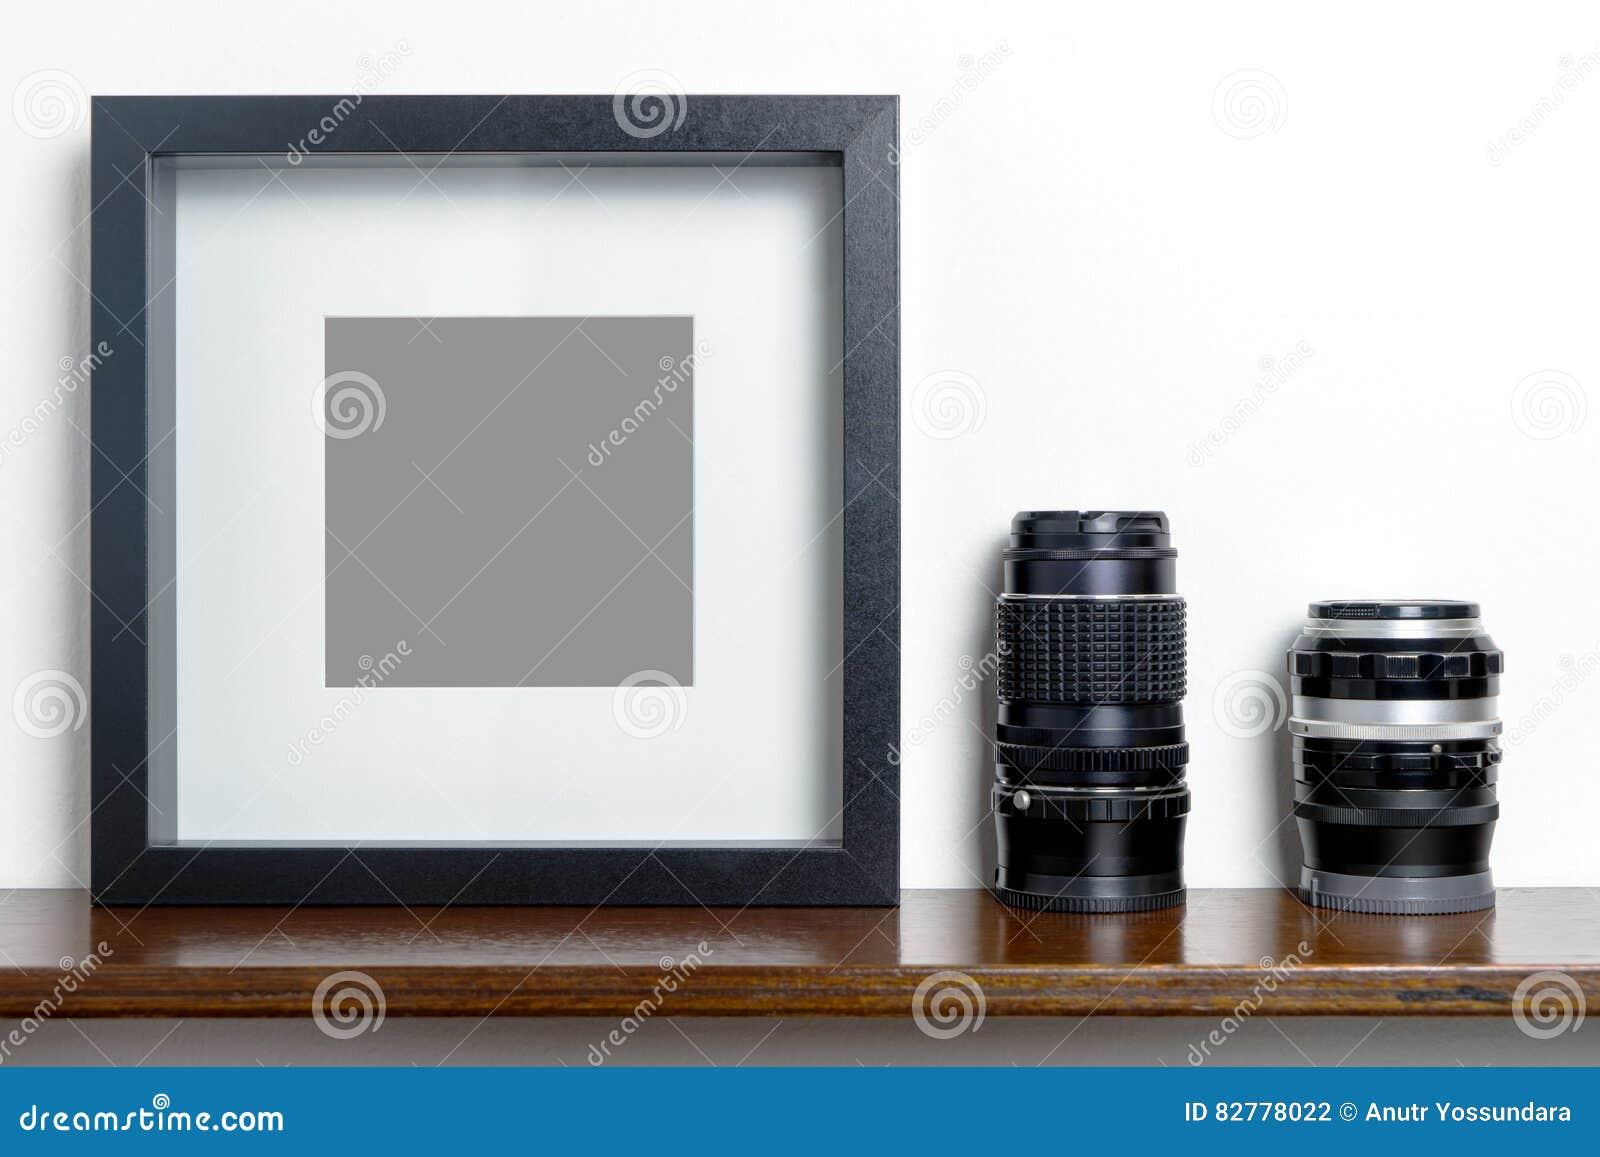 Starker leerer schwarzer Fotorahmen auf RegalKameraobjektiv